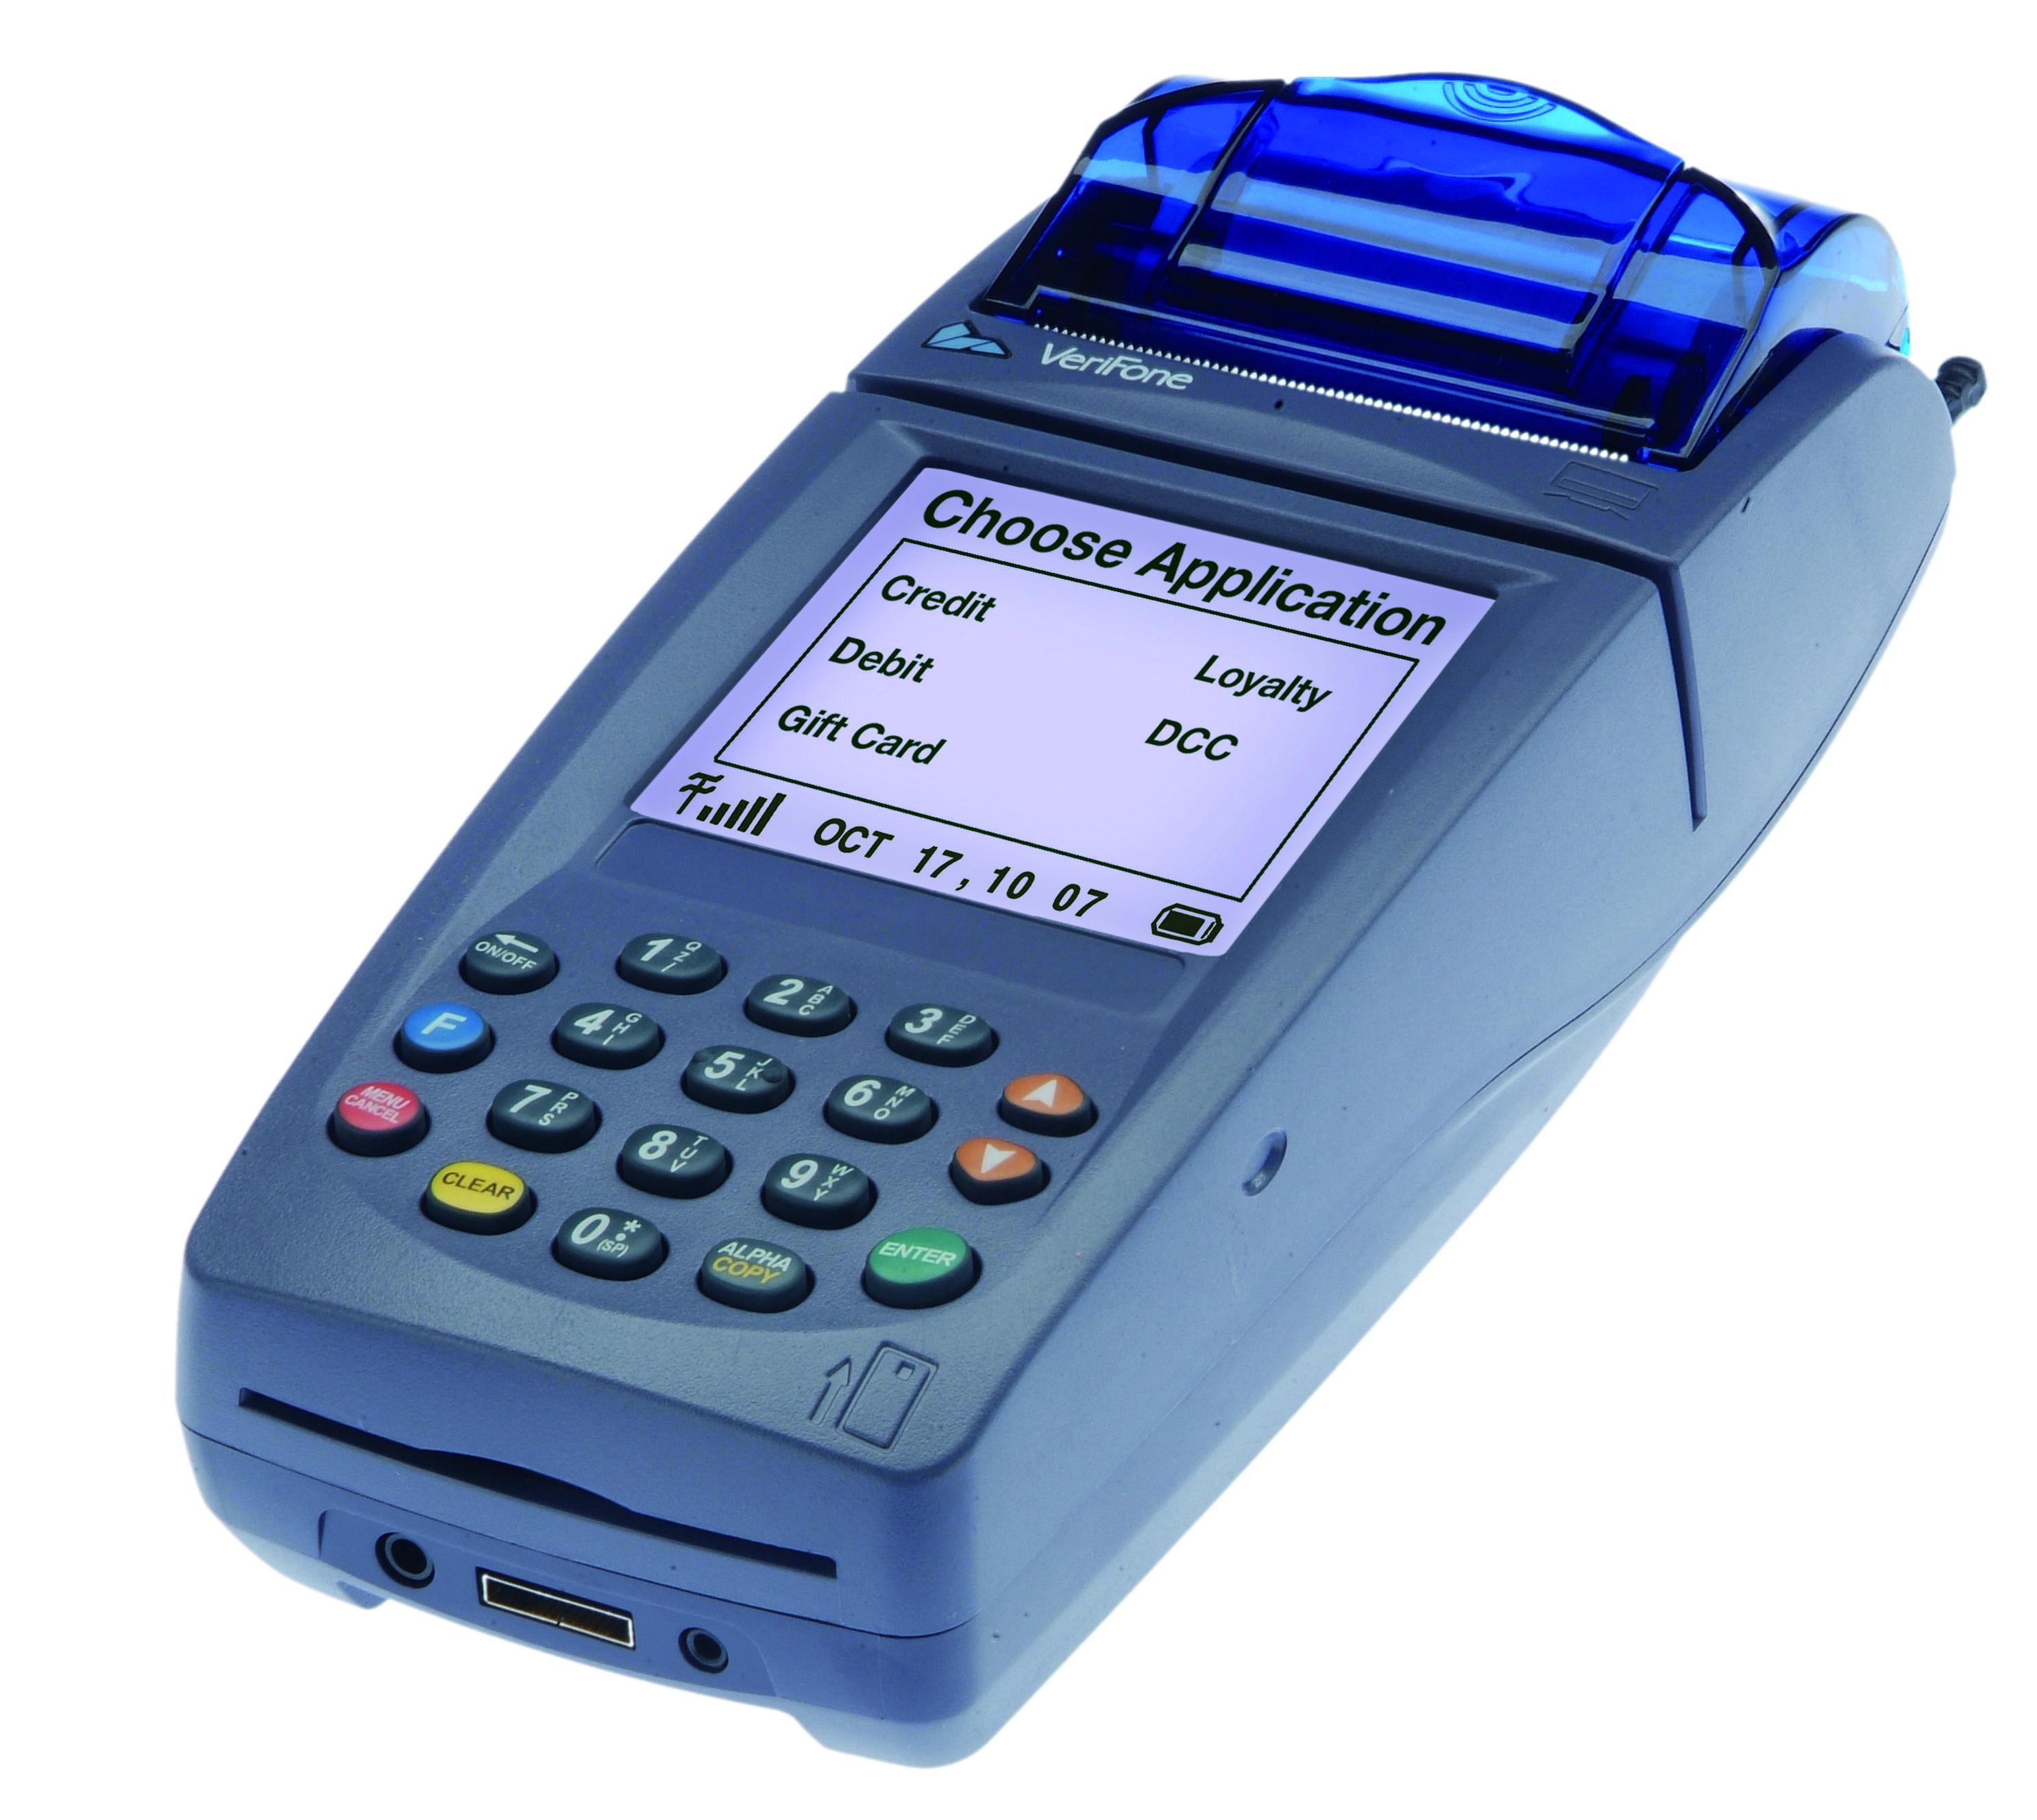 Nurit 8020 Wireless Credit Card Machine Credit Card Terminal Credit Card Terminals